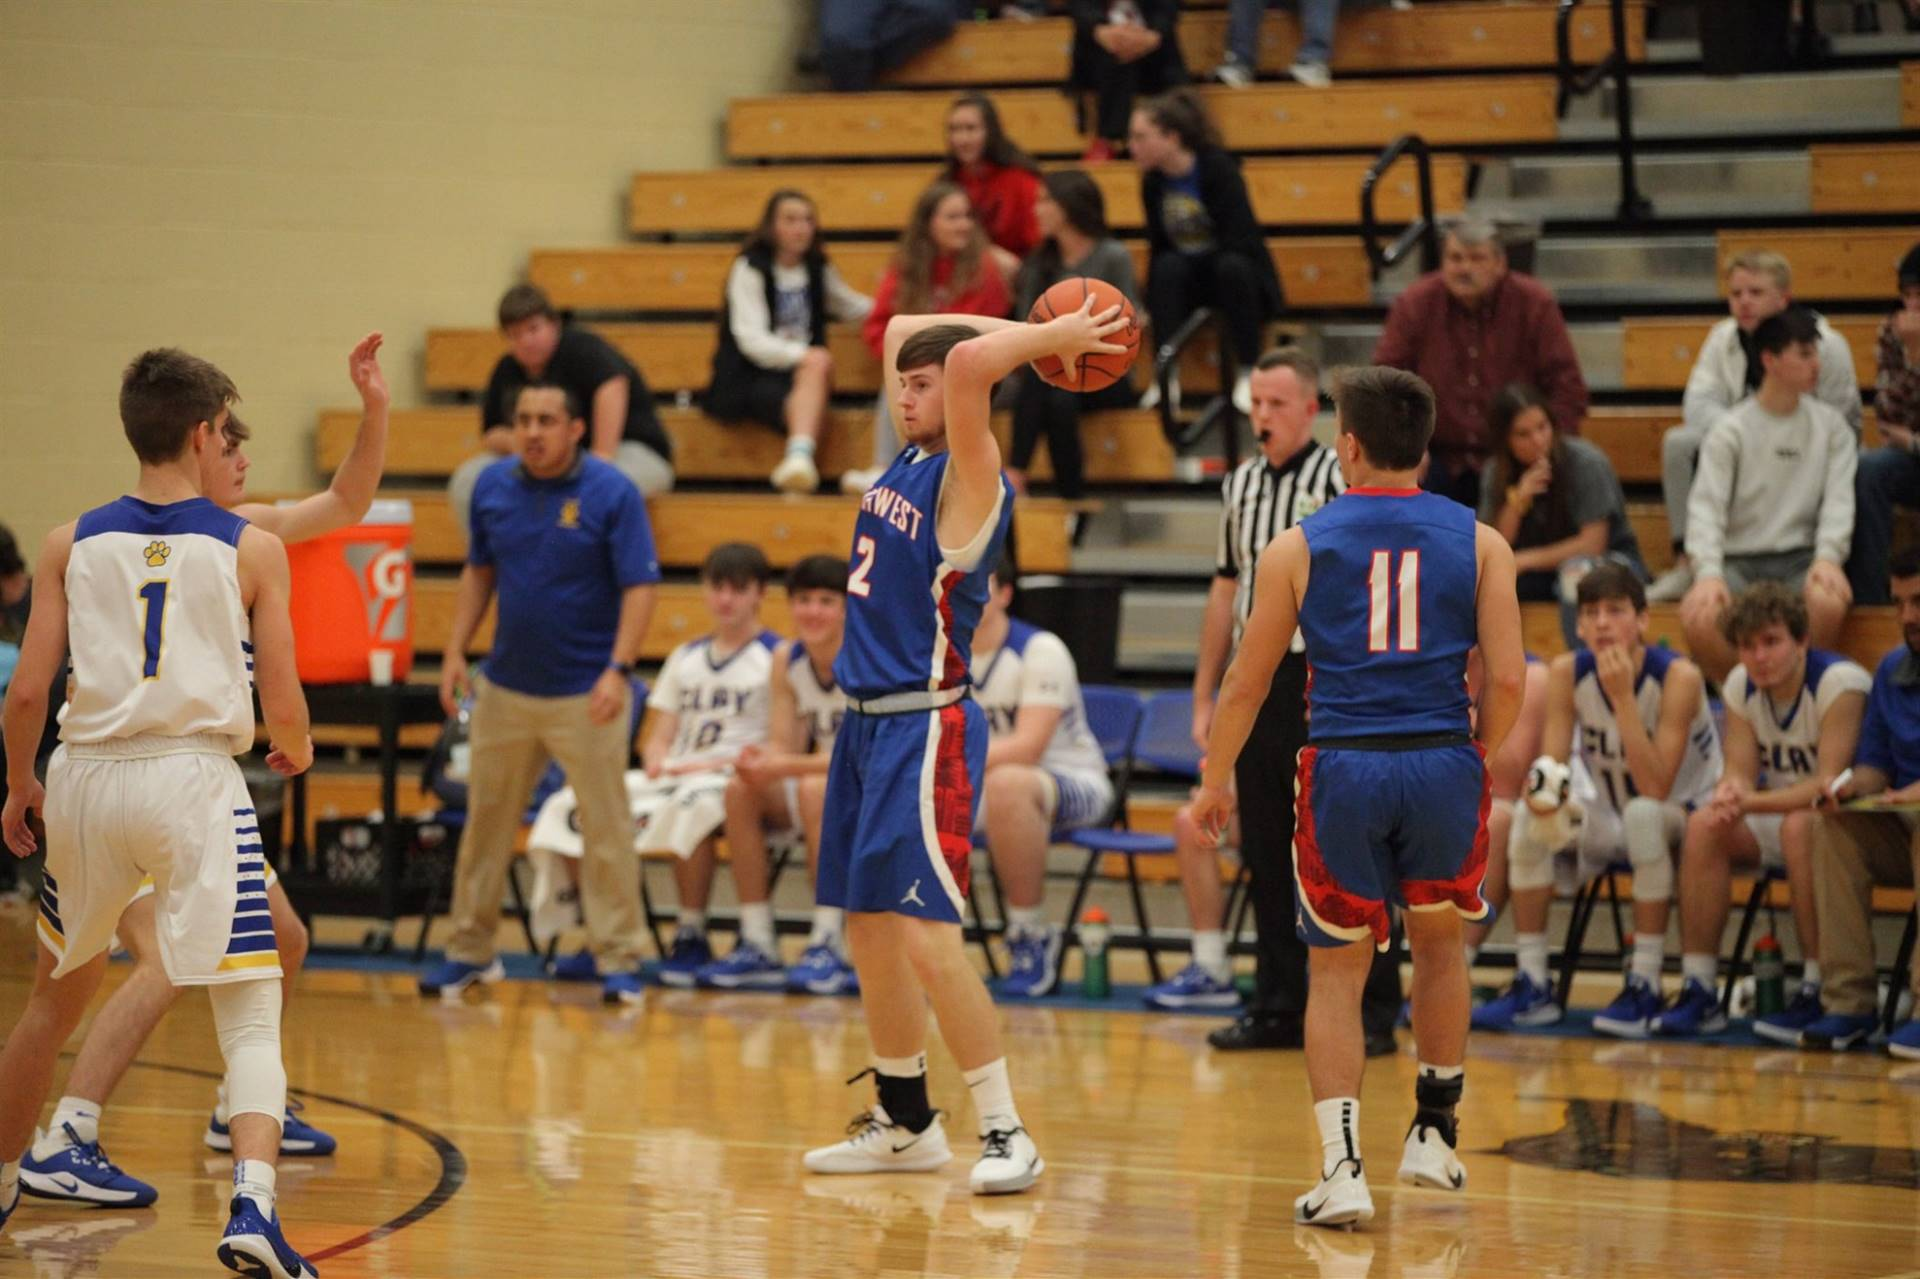 BasketballBasketball